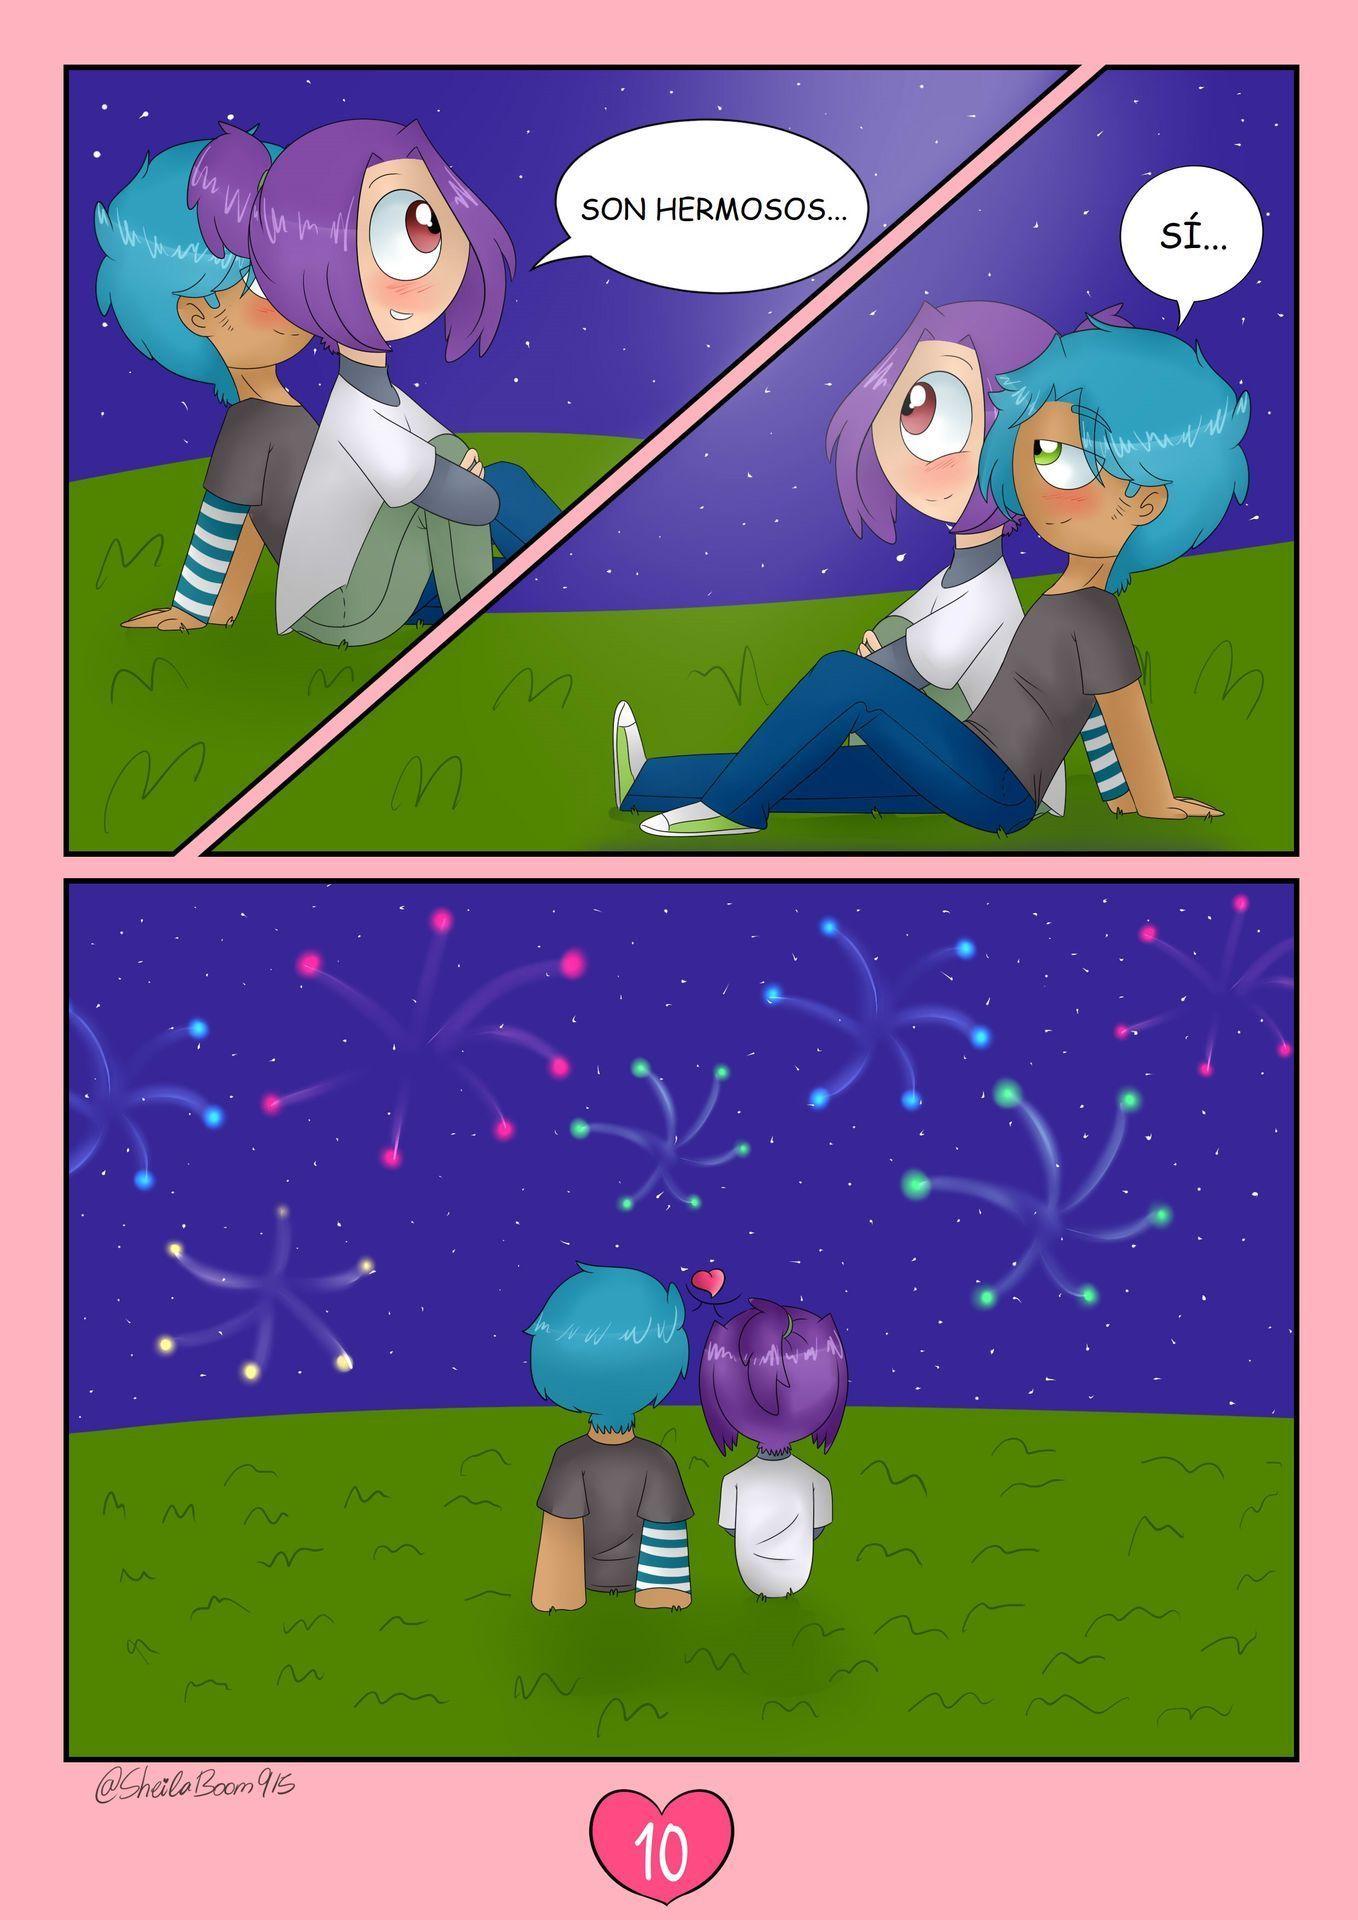 Las Luces Del Alba Comic Bxb 17 Pagina 10 Comic Imagenes Fnafhs Fnafhs